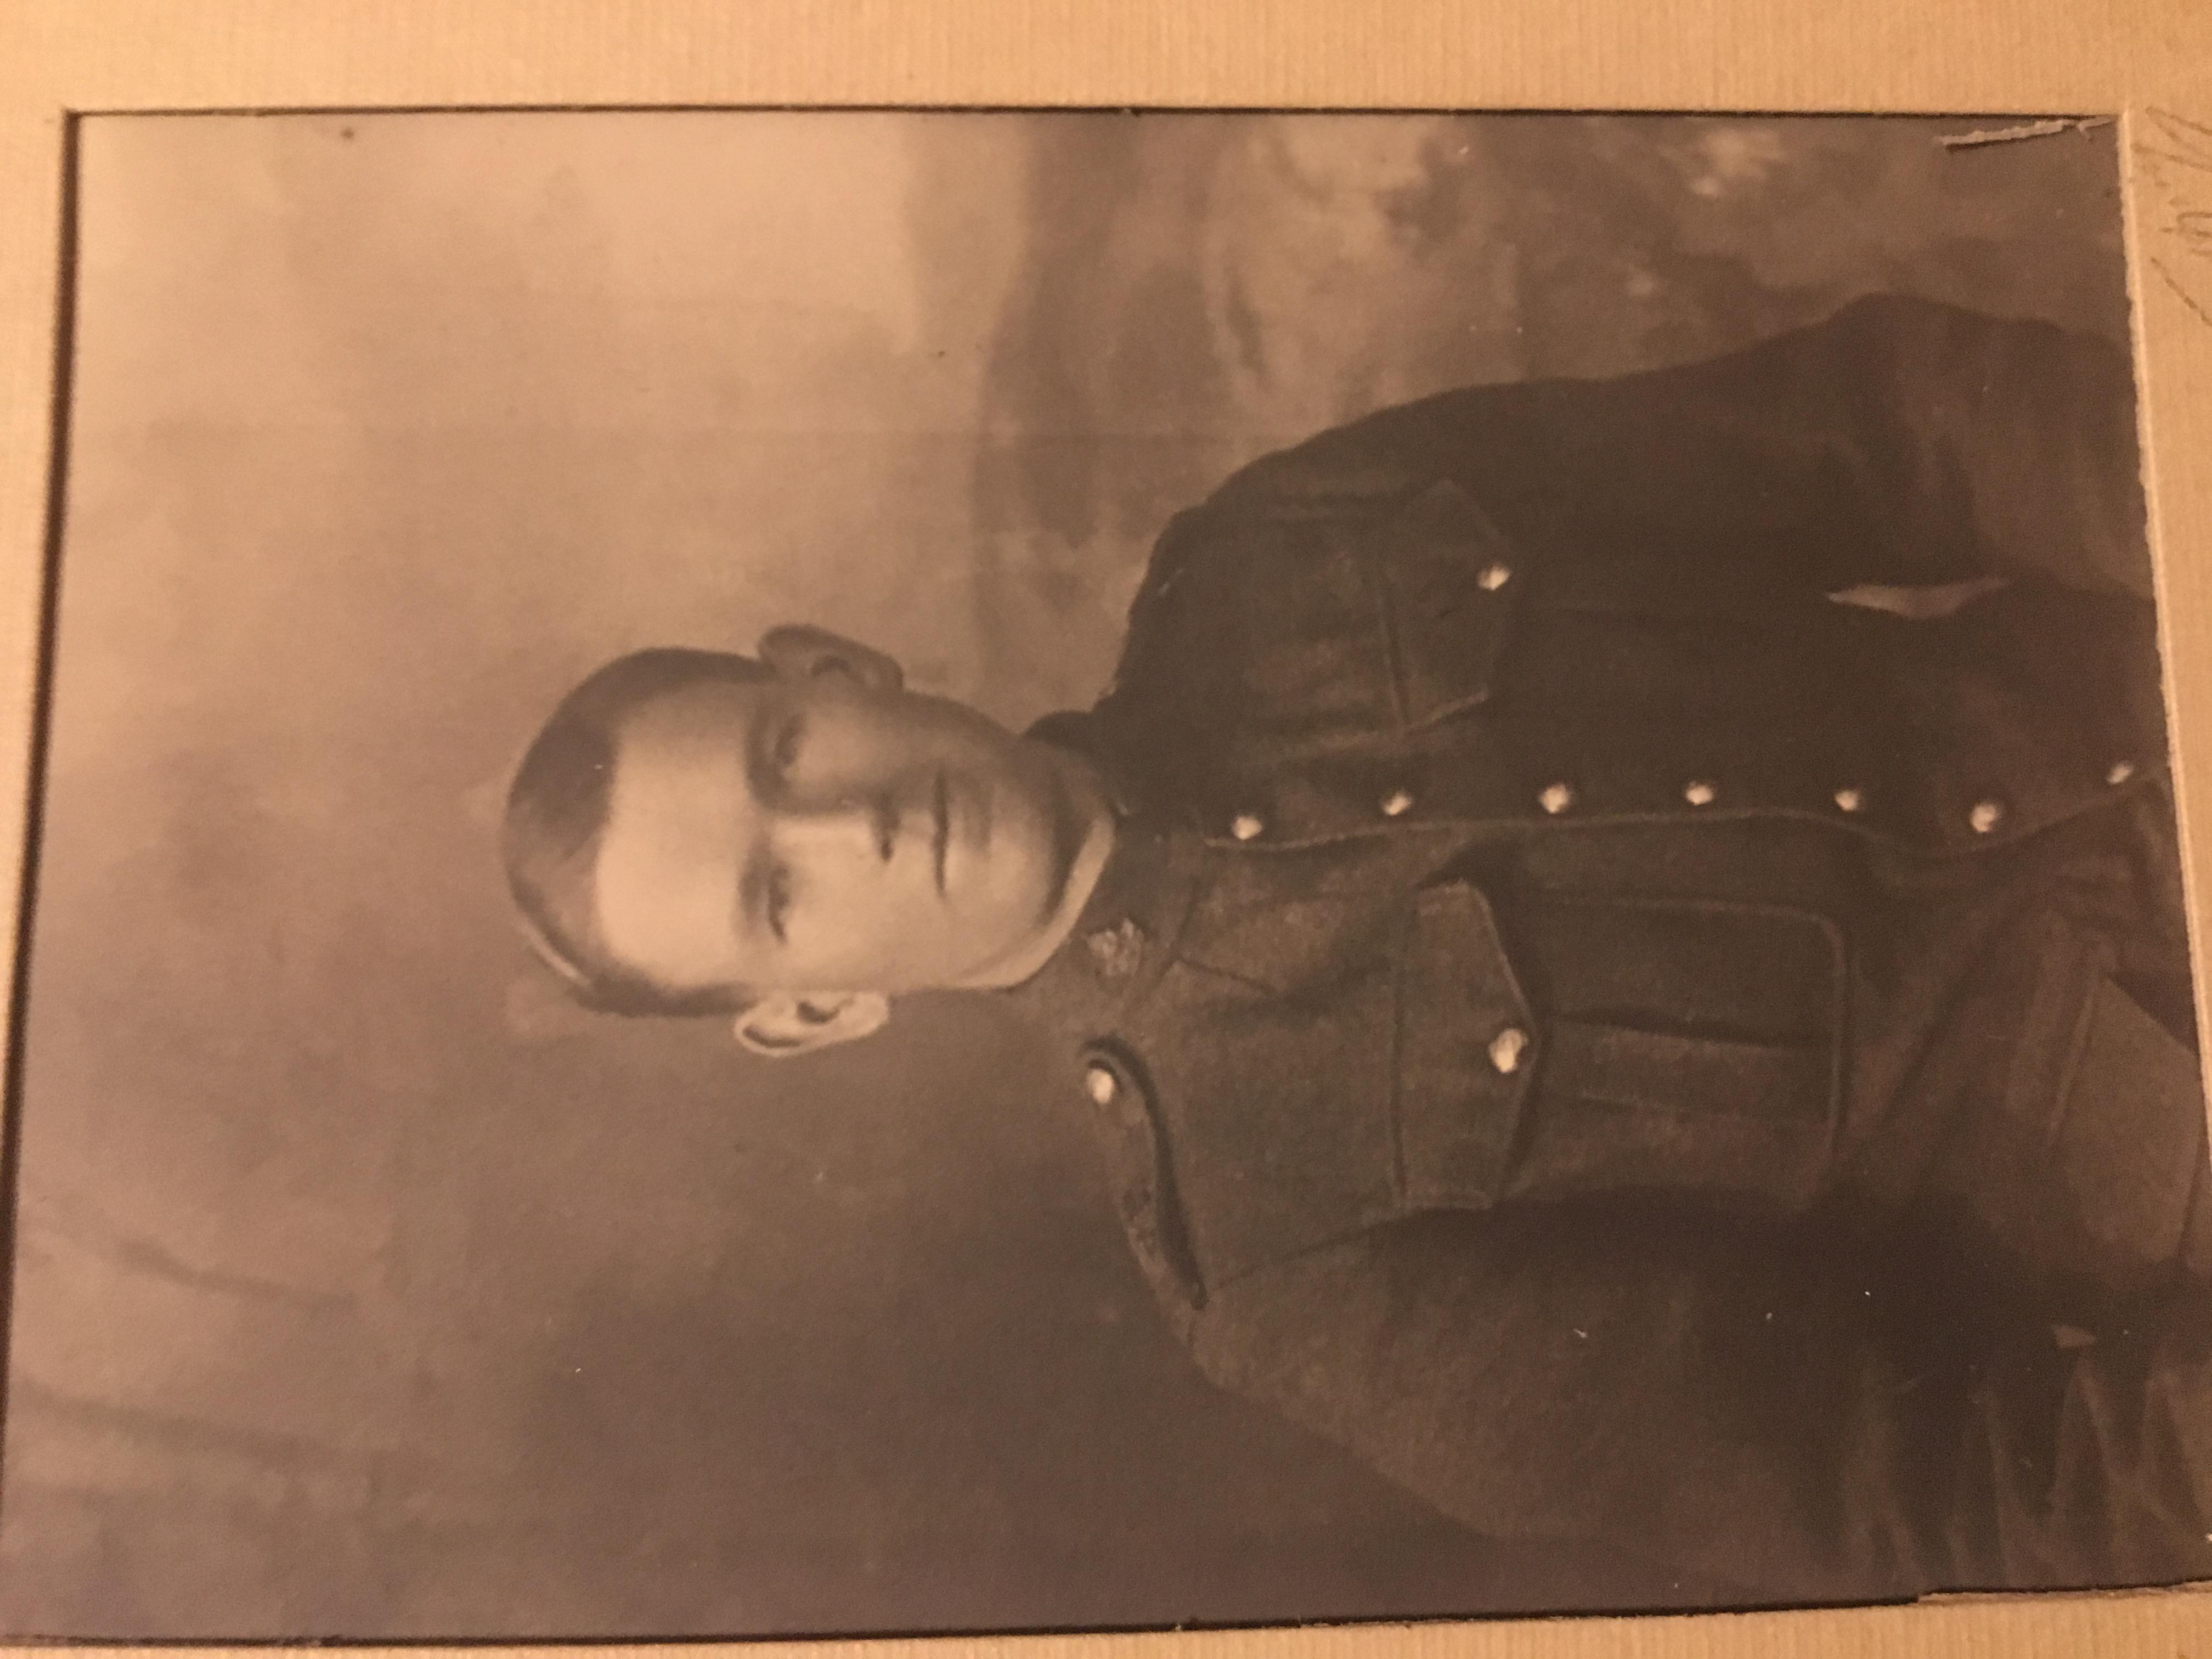 Canadian Fallen Soldier - Lance Corporal JOHN MCGREGOR